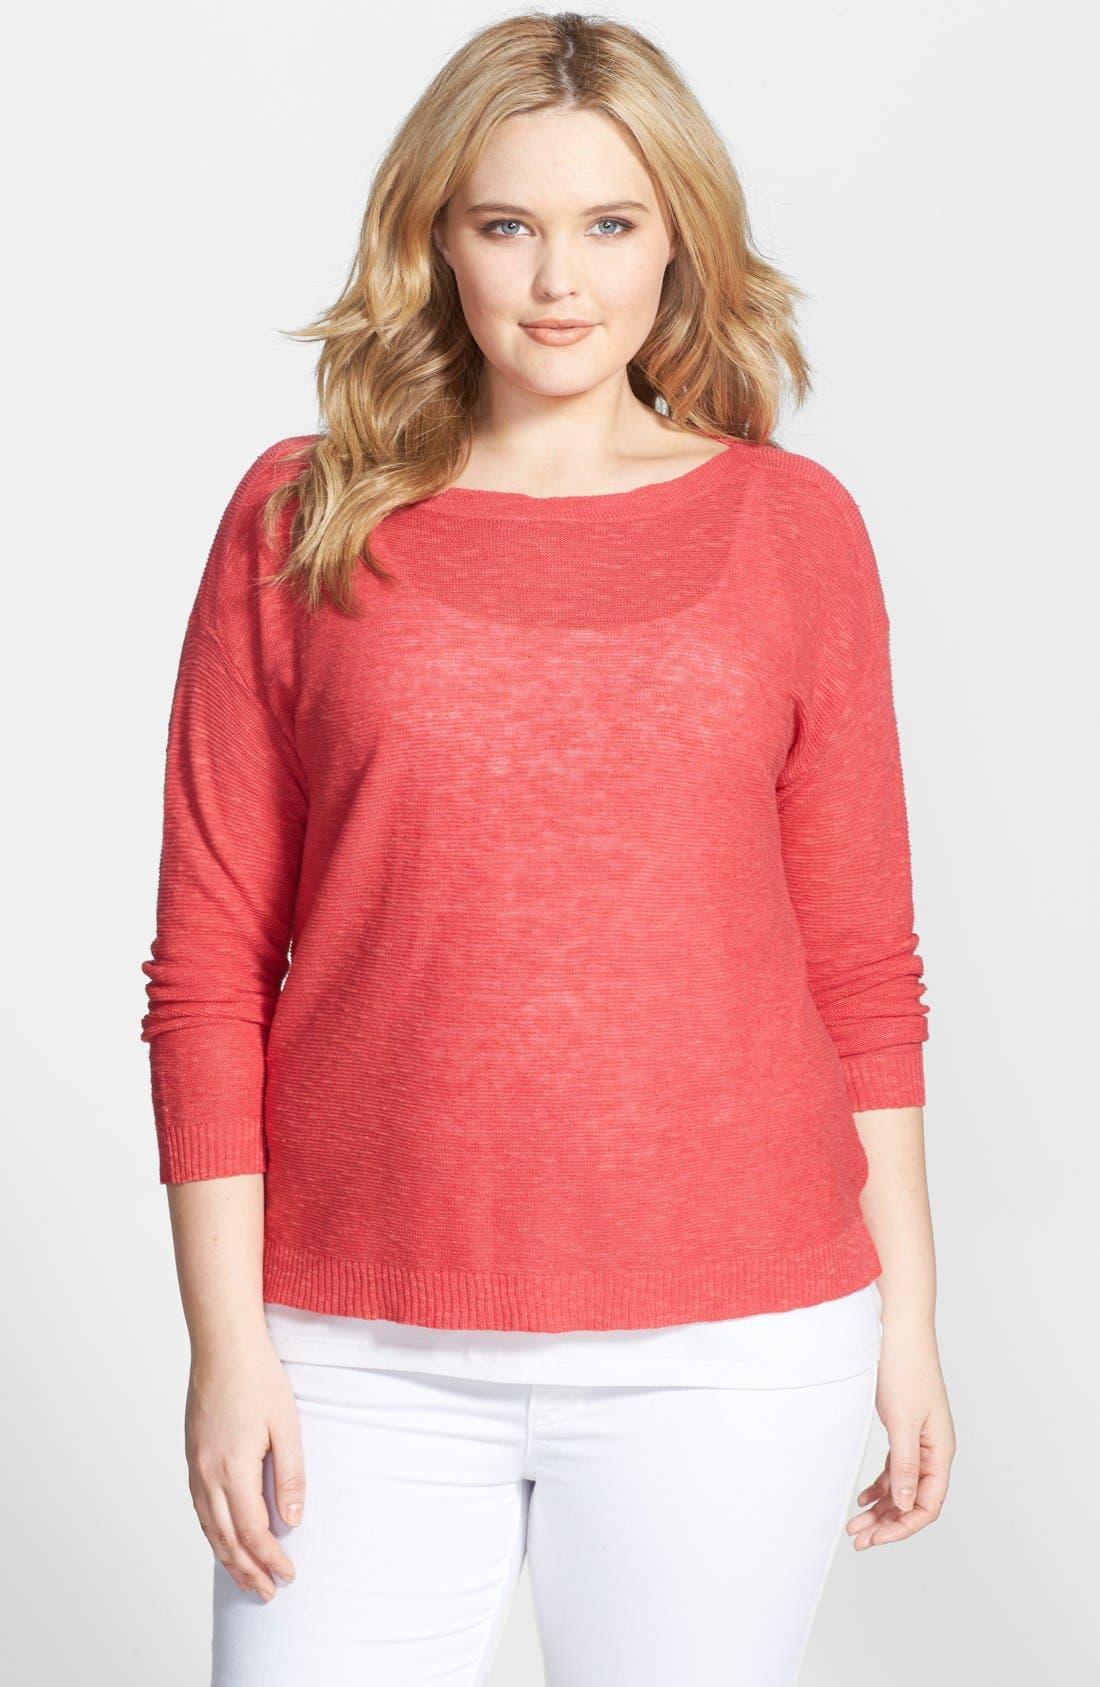 Main Image - Eileen Fisher Organic Linen & Cotton Boat Neck Slub Sweater (Plus Size)